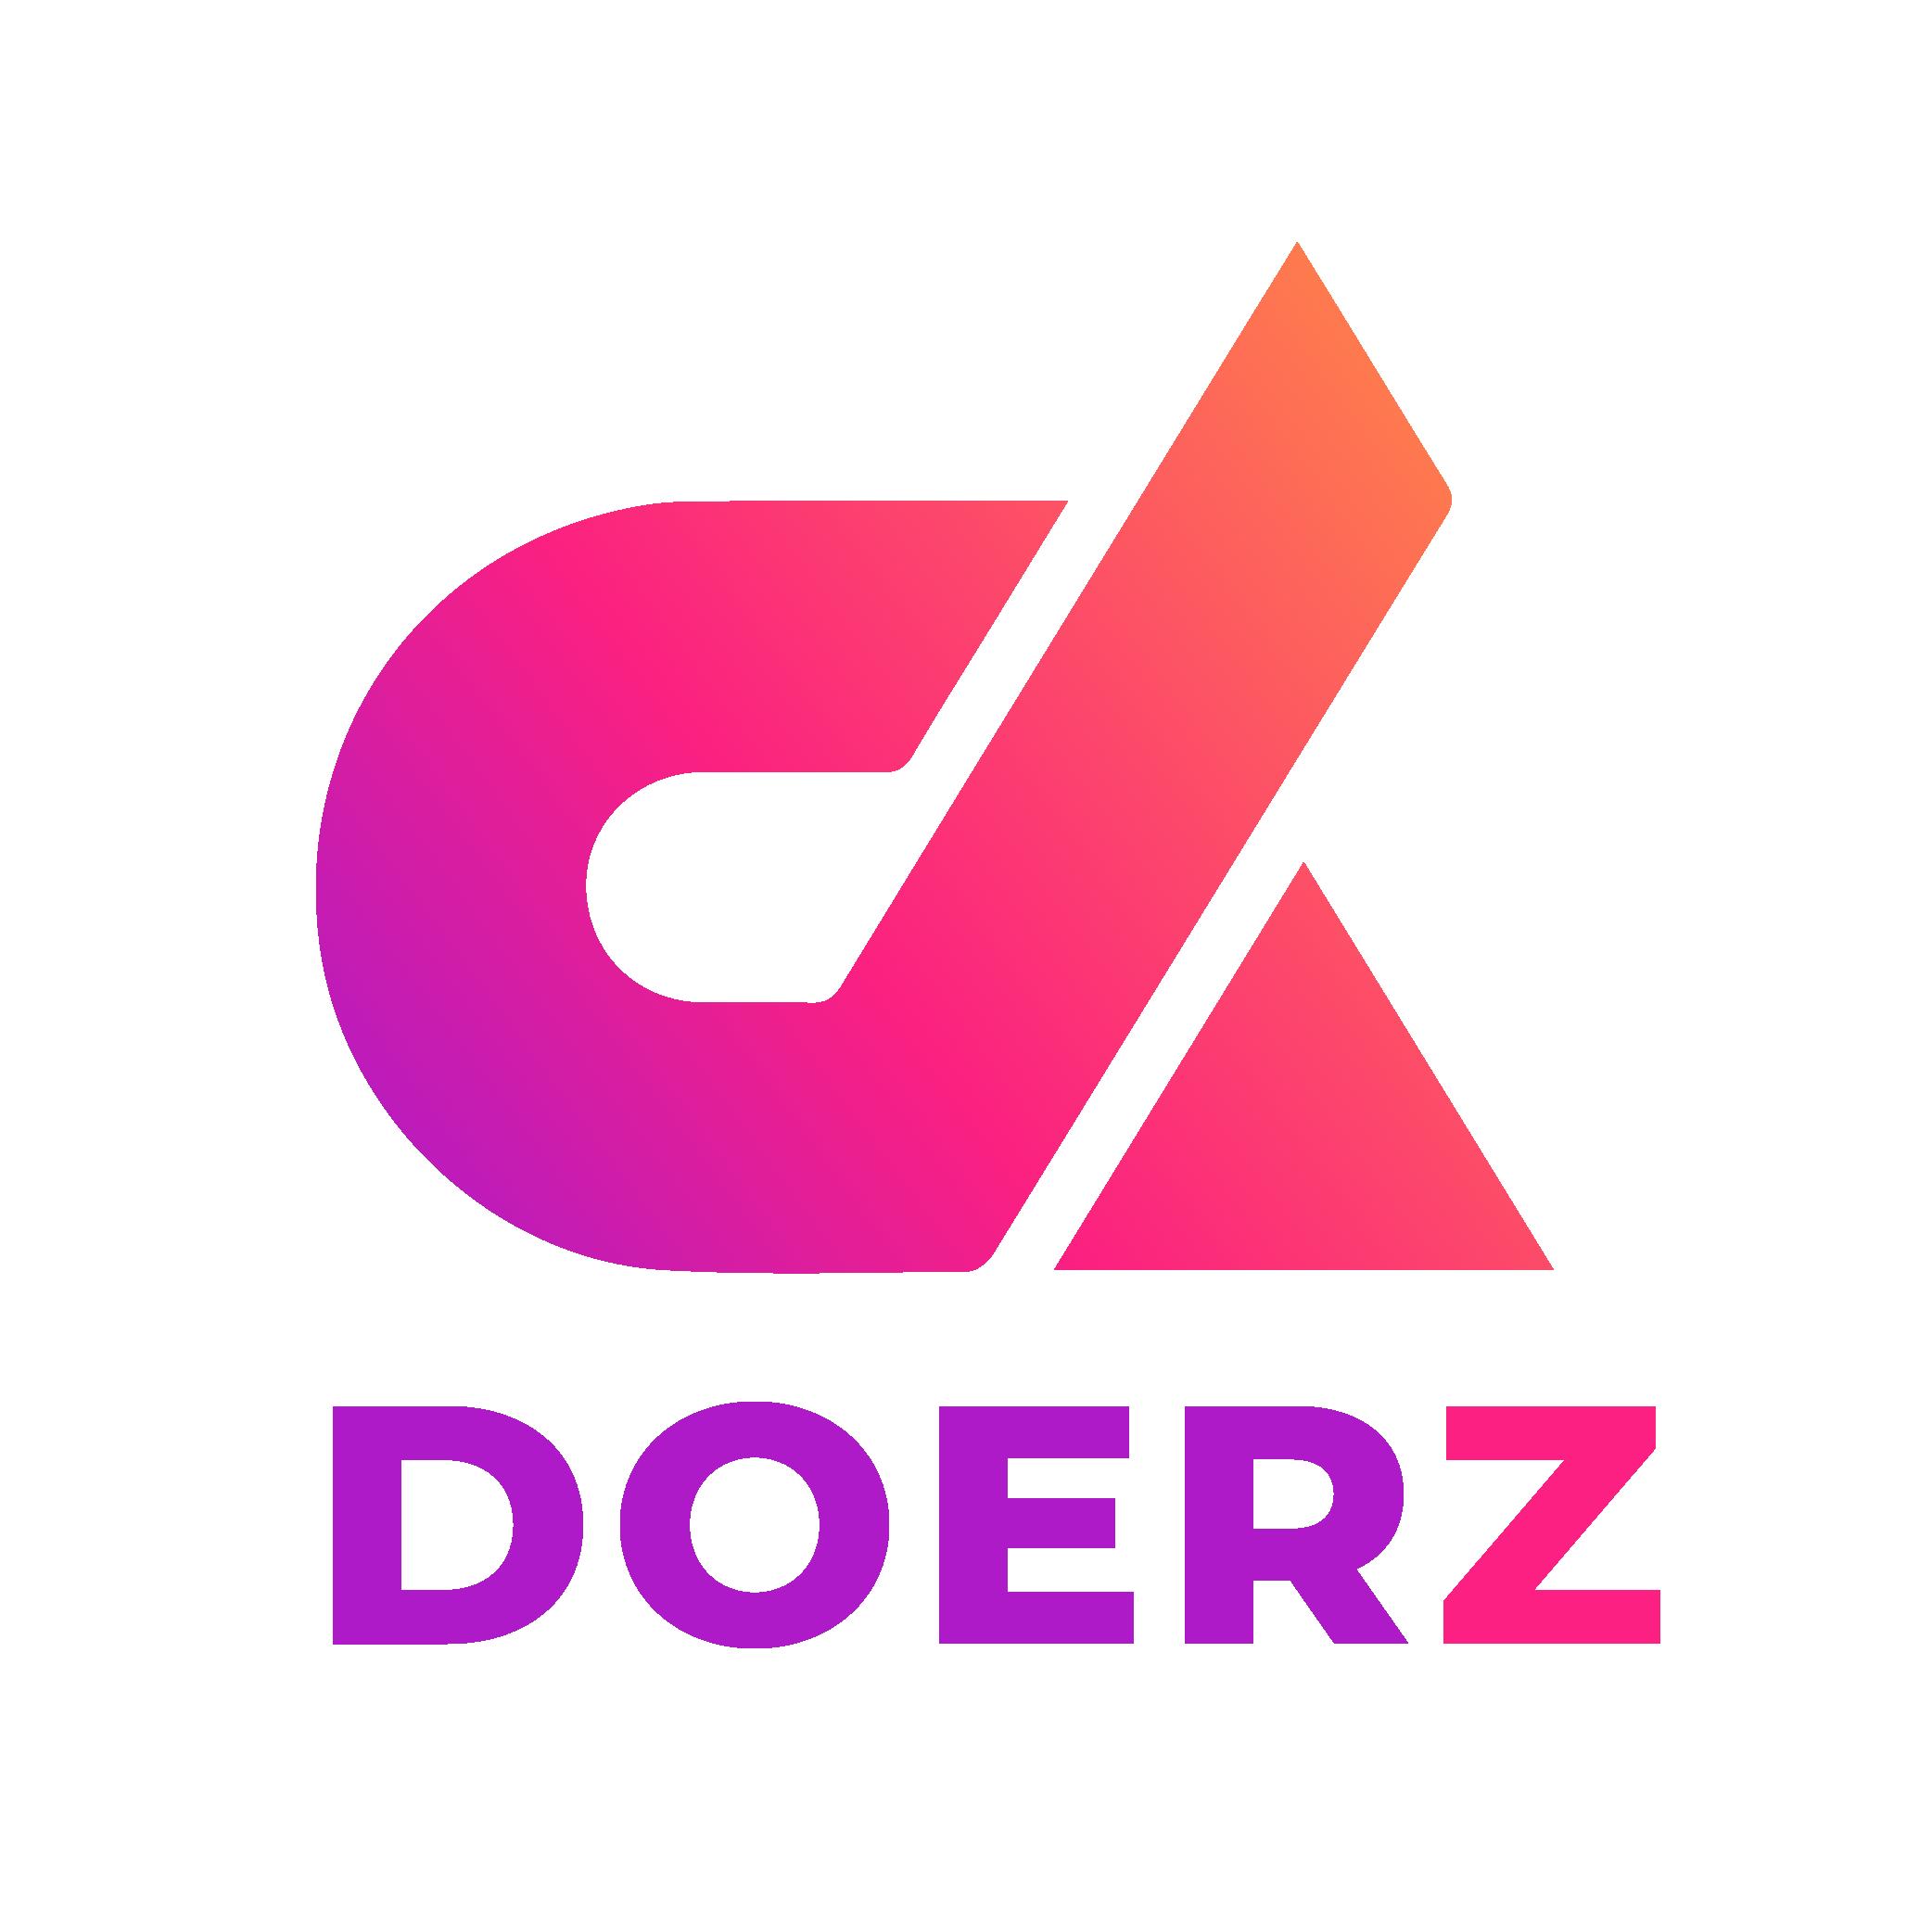 Doerz - Full Service Digital Agency Logo